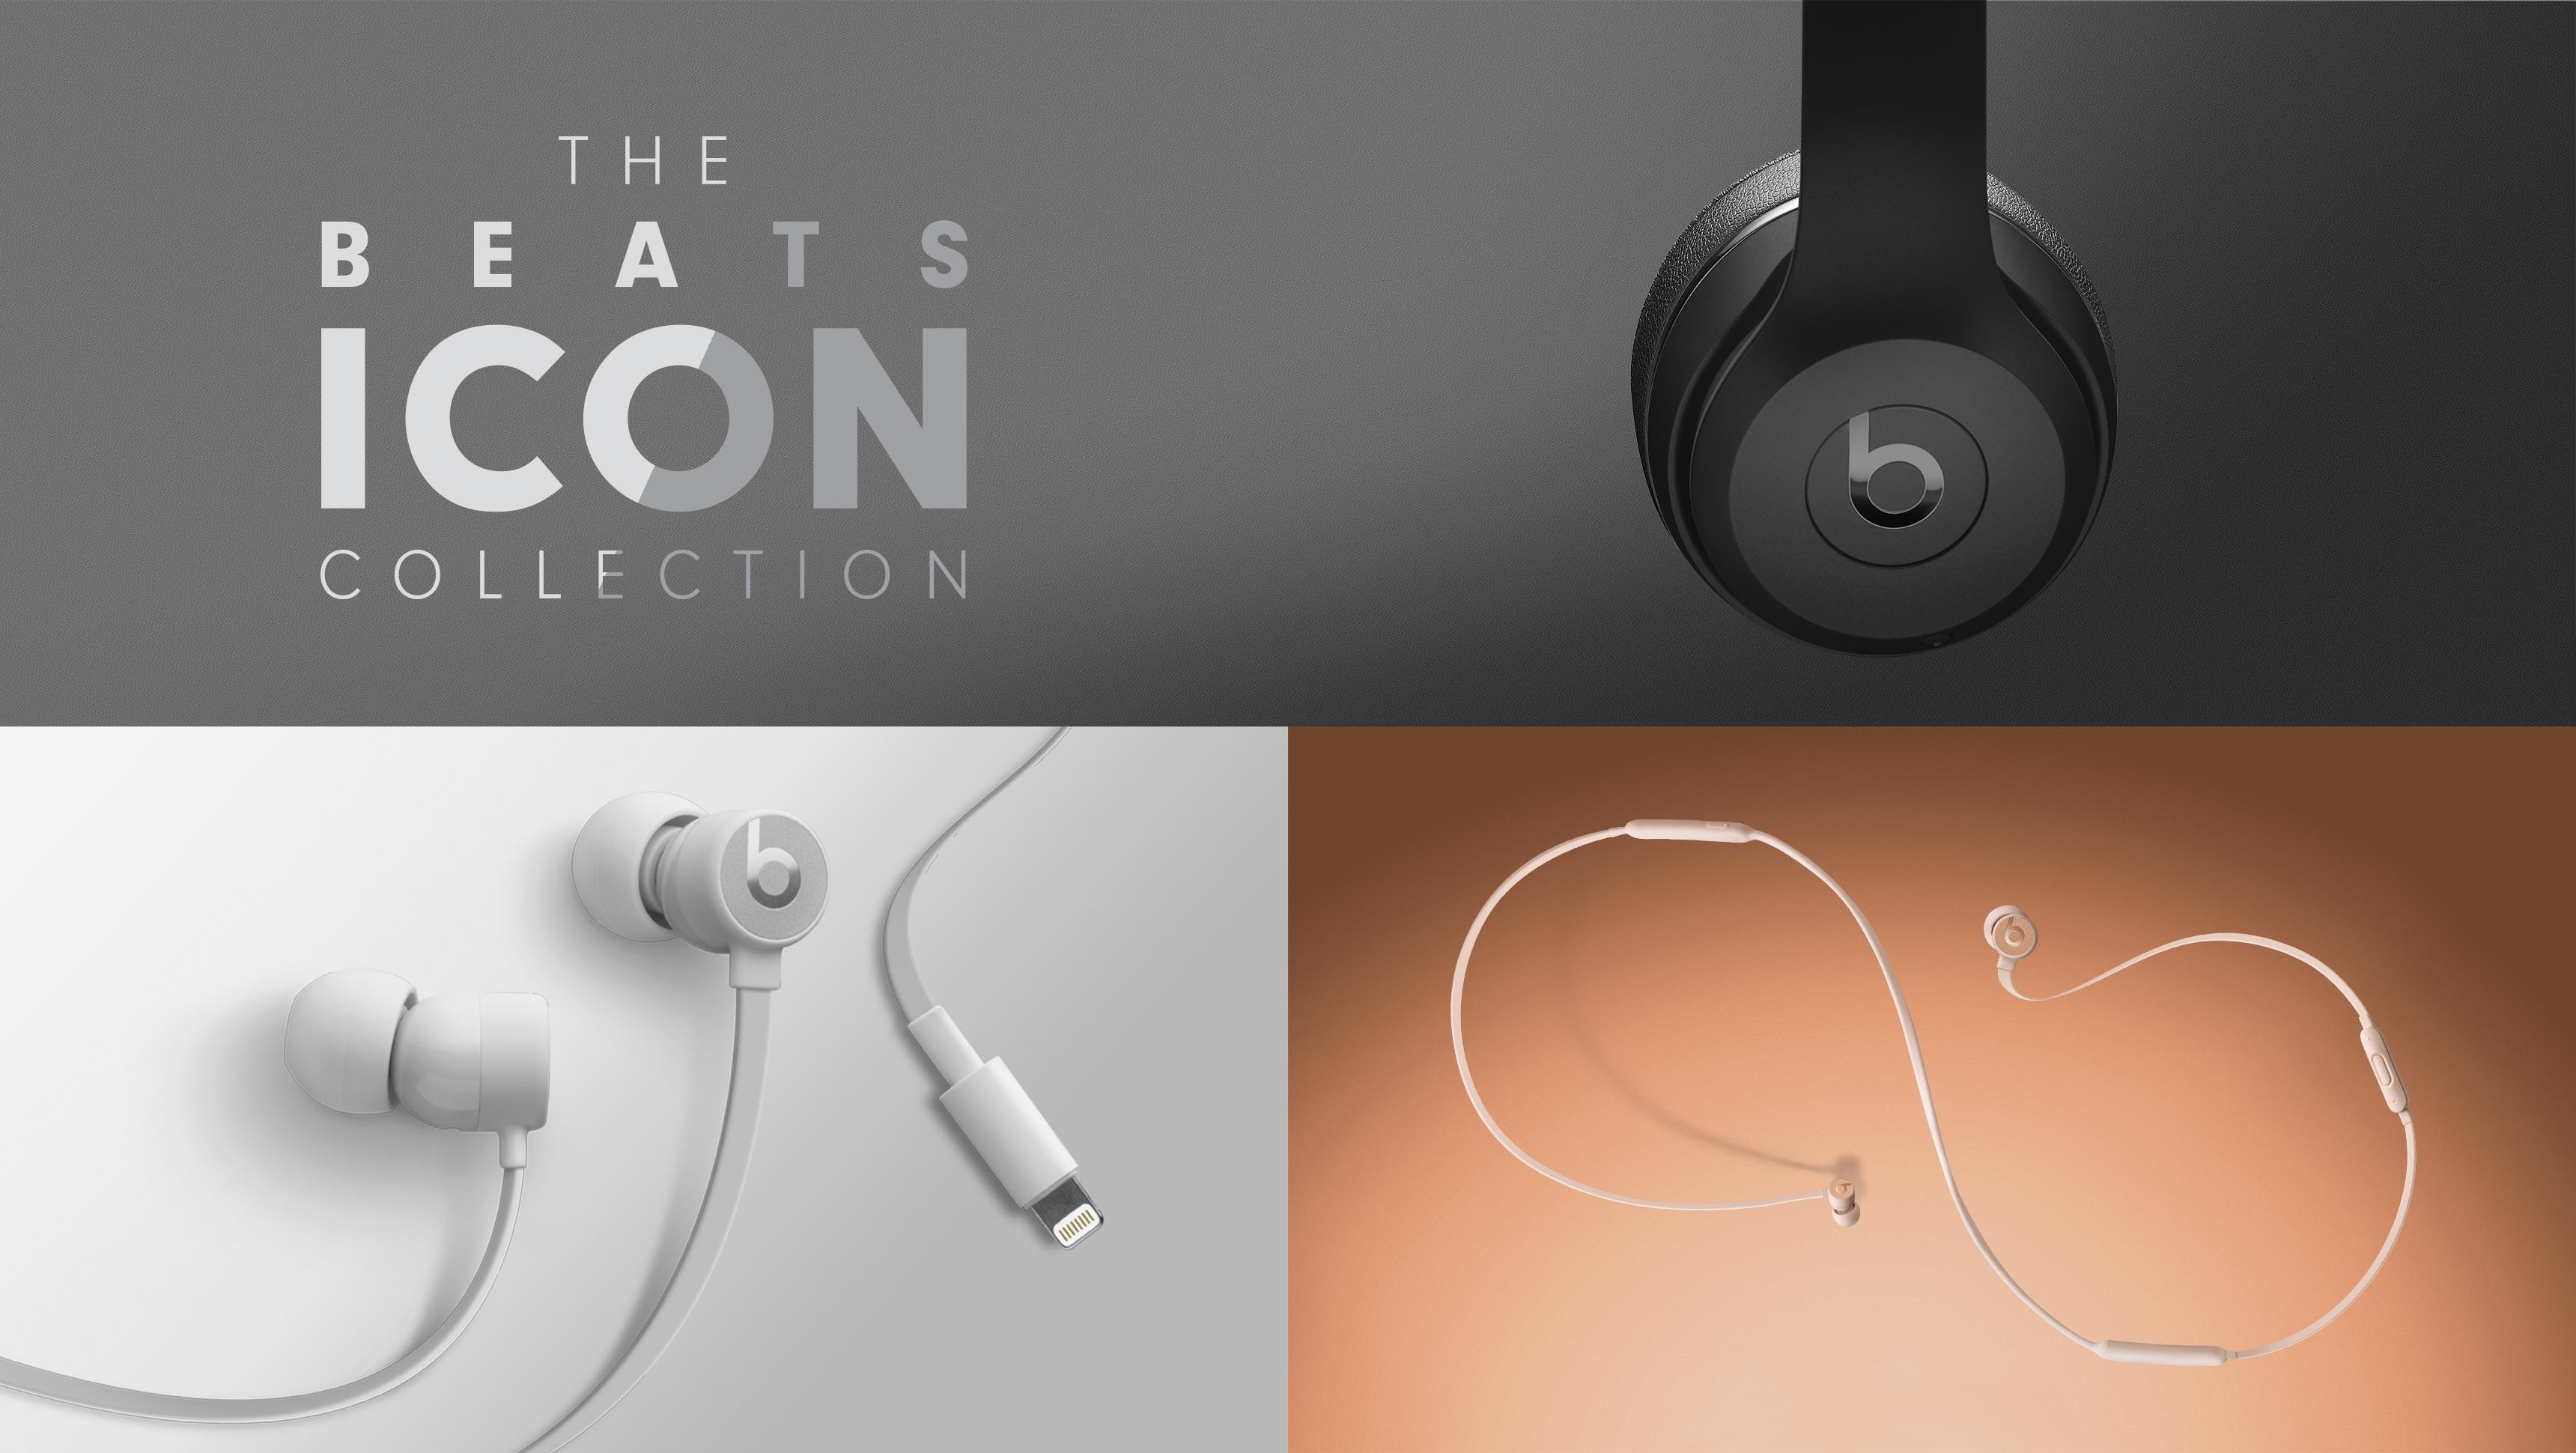 Apple beats x wireless earphones - apple style earphones